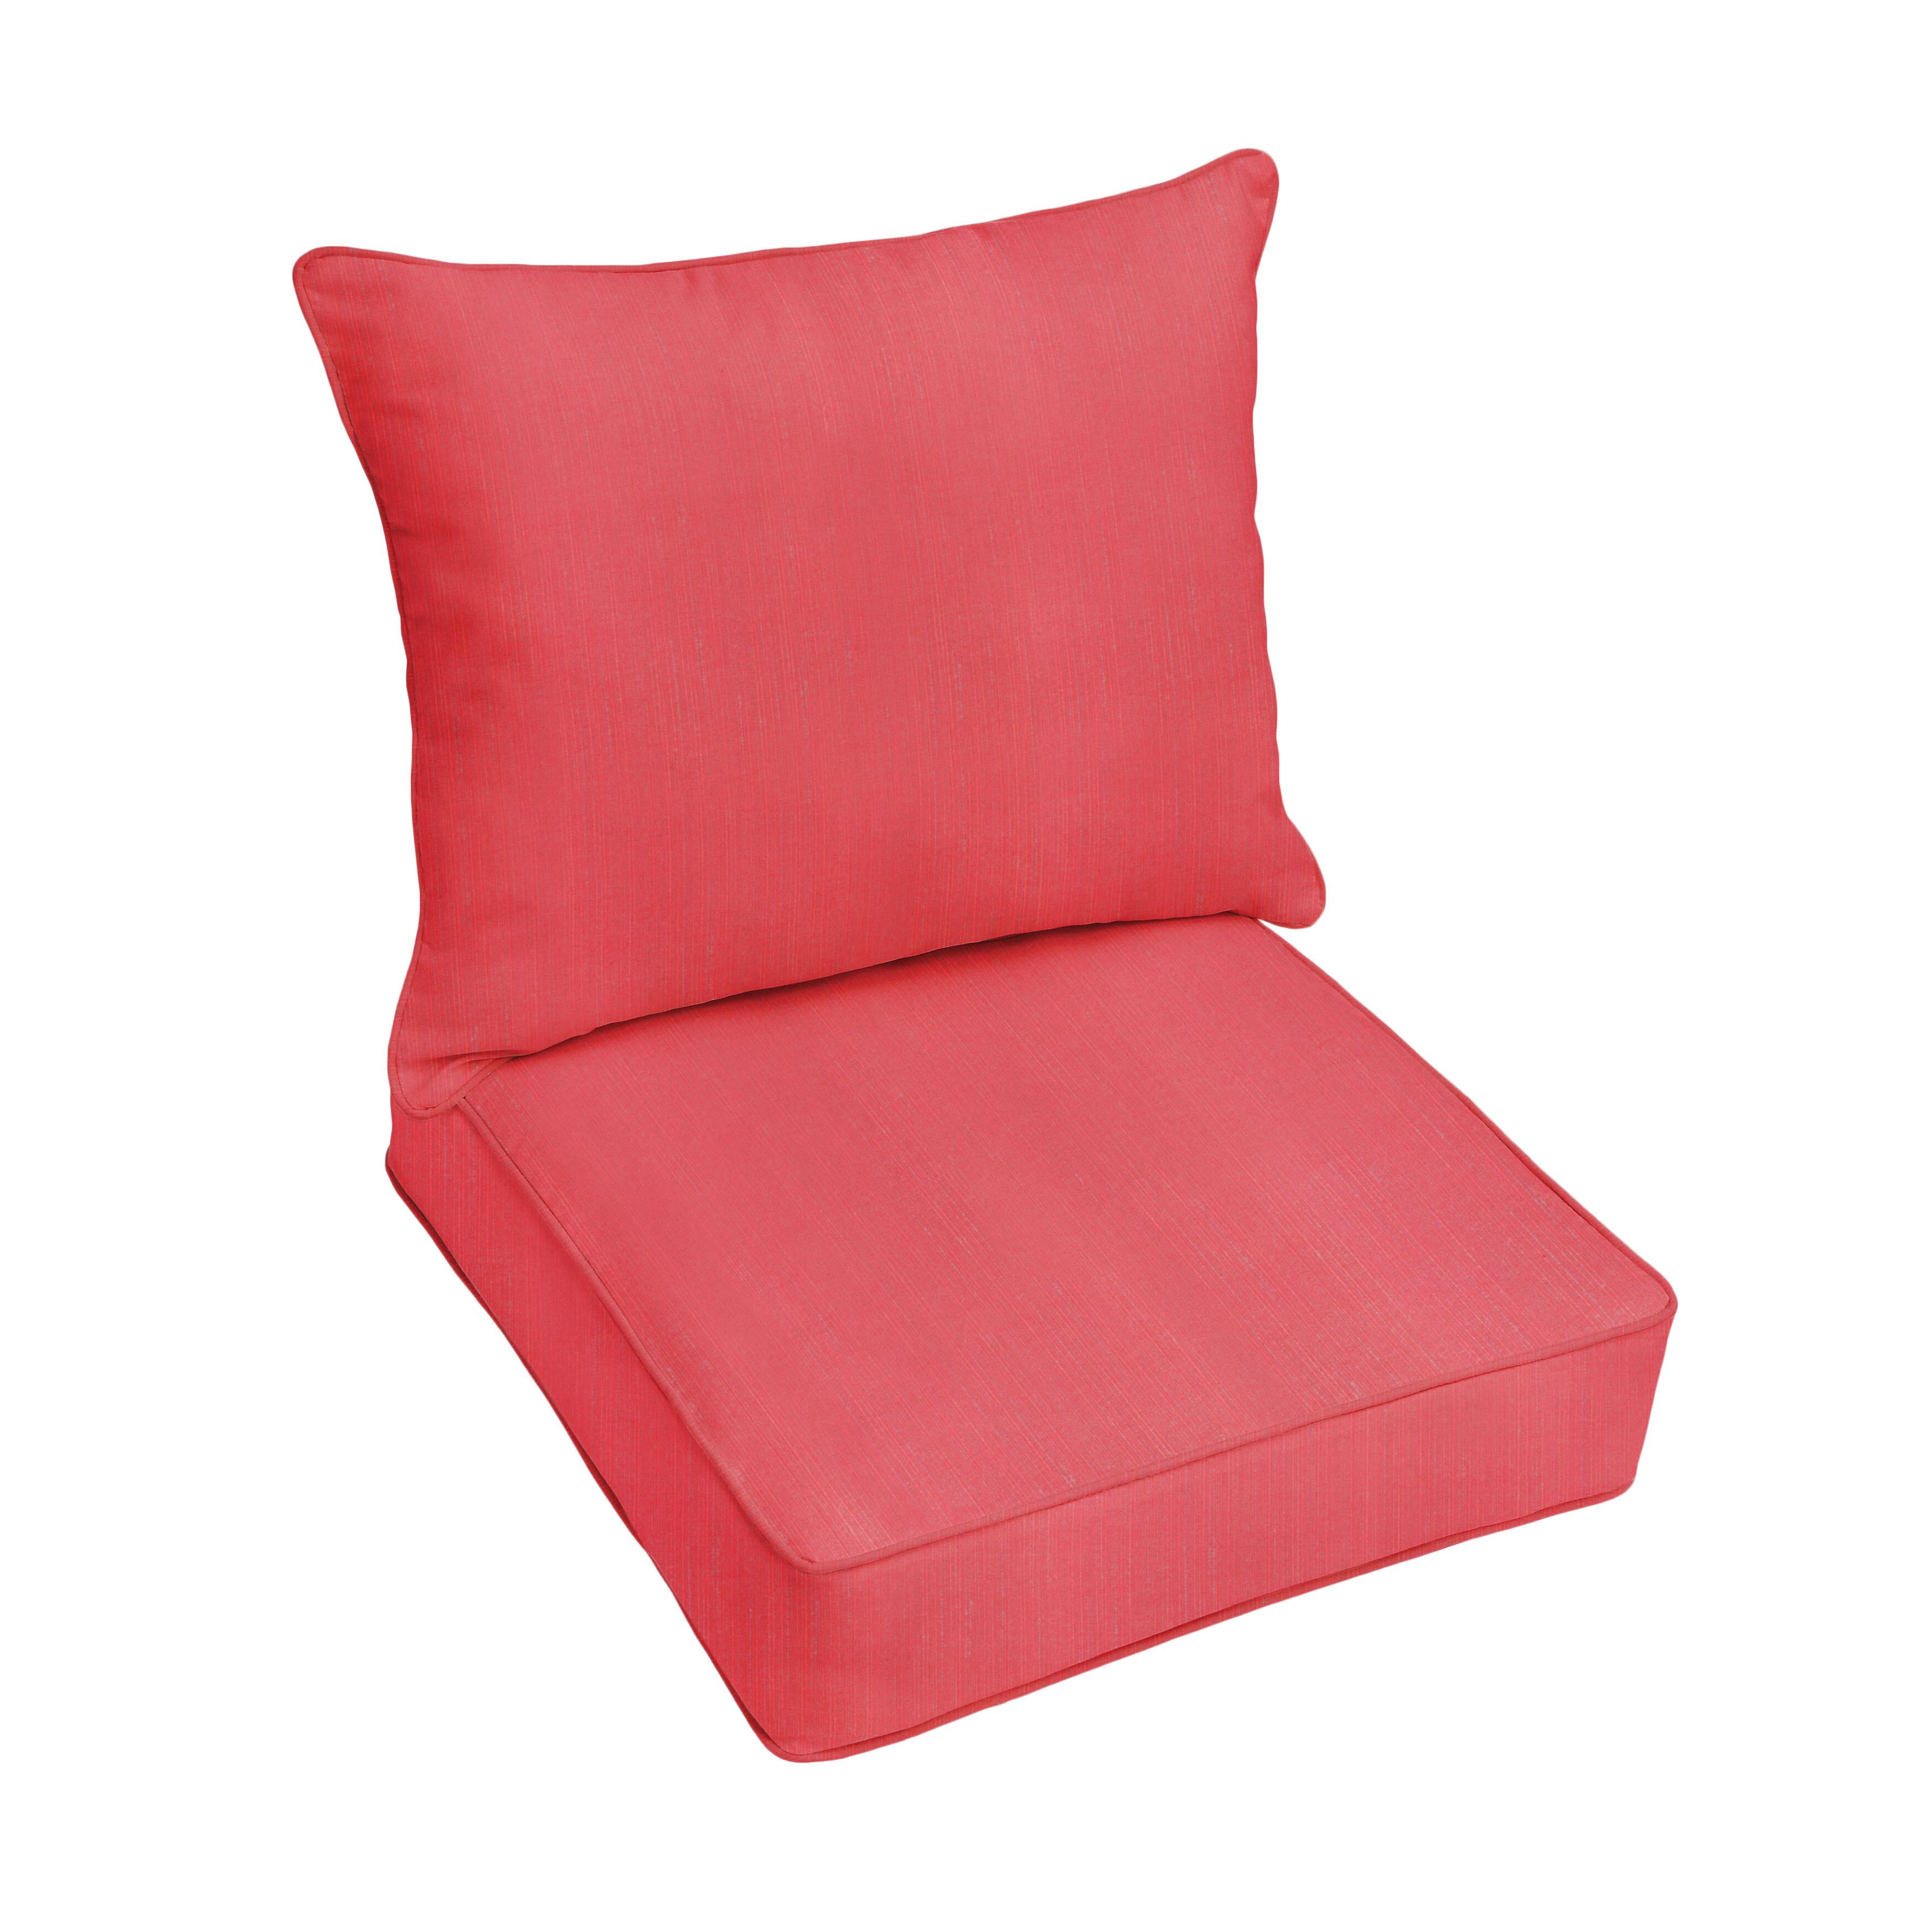 Darby Home Co Textured Indoor Outdoor Sunbrella Lounge Chair Cushion Set Wayfair